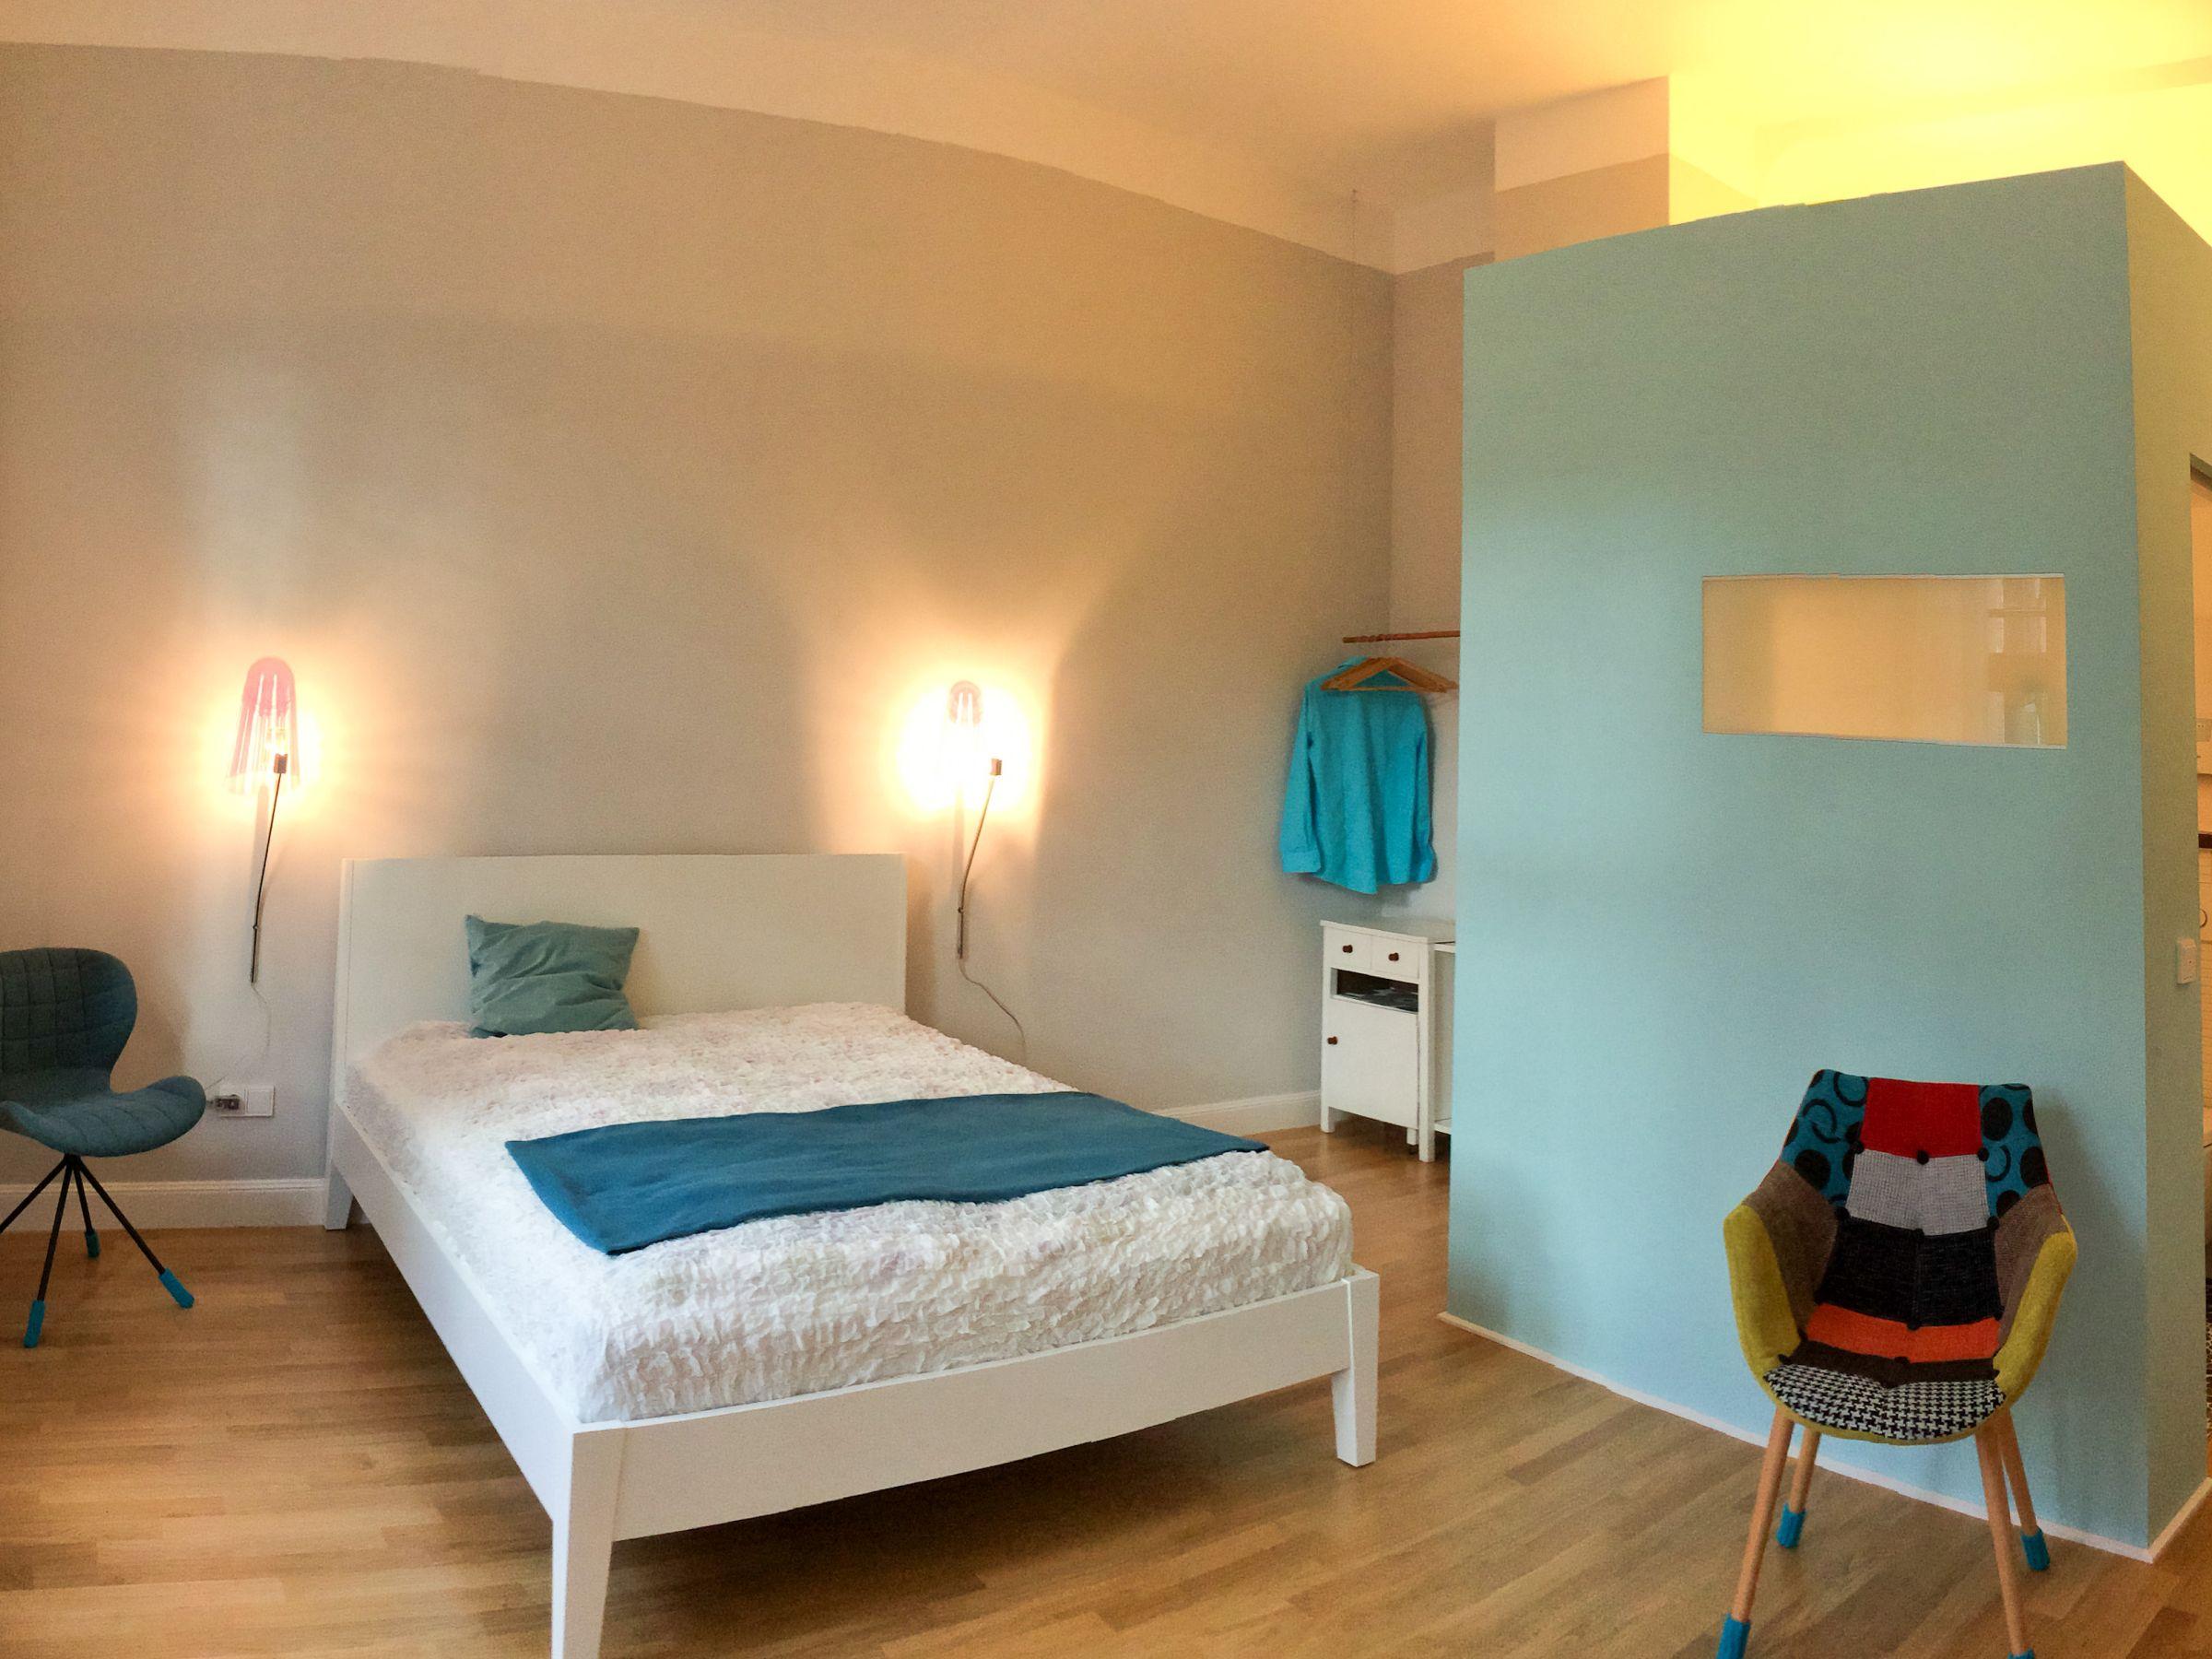 aTa and oMo, (Köln). Appartment aTa, 22qm, 1 Wohn-/Schlafzimmer, max. 2 Personen